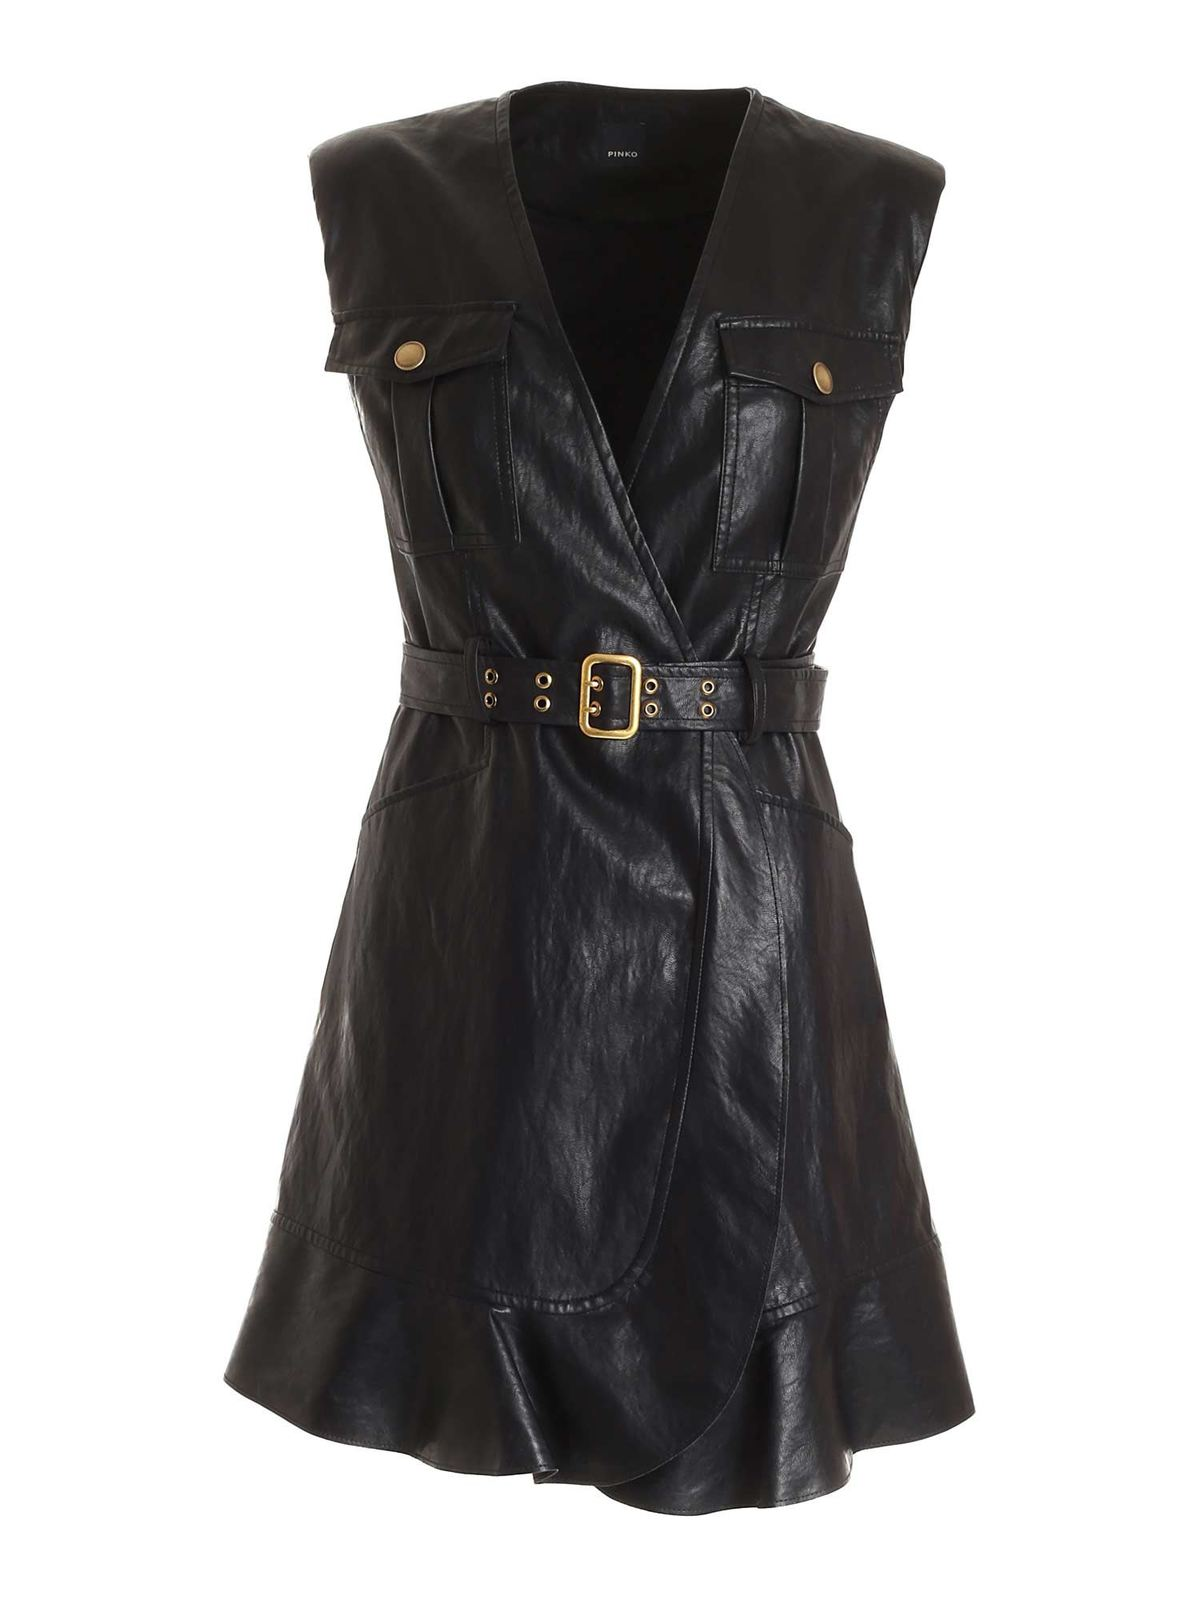 Pinko ATTIVO DRESS IN BLACK